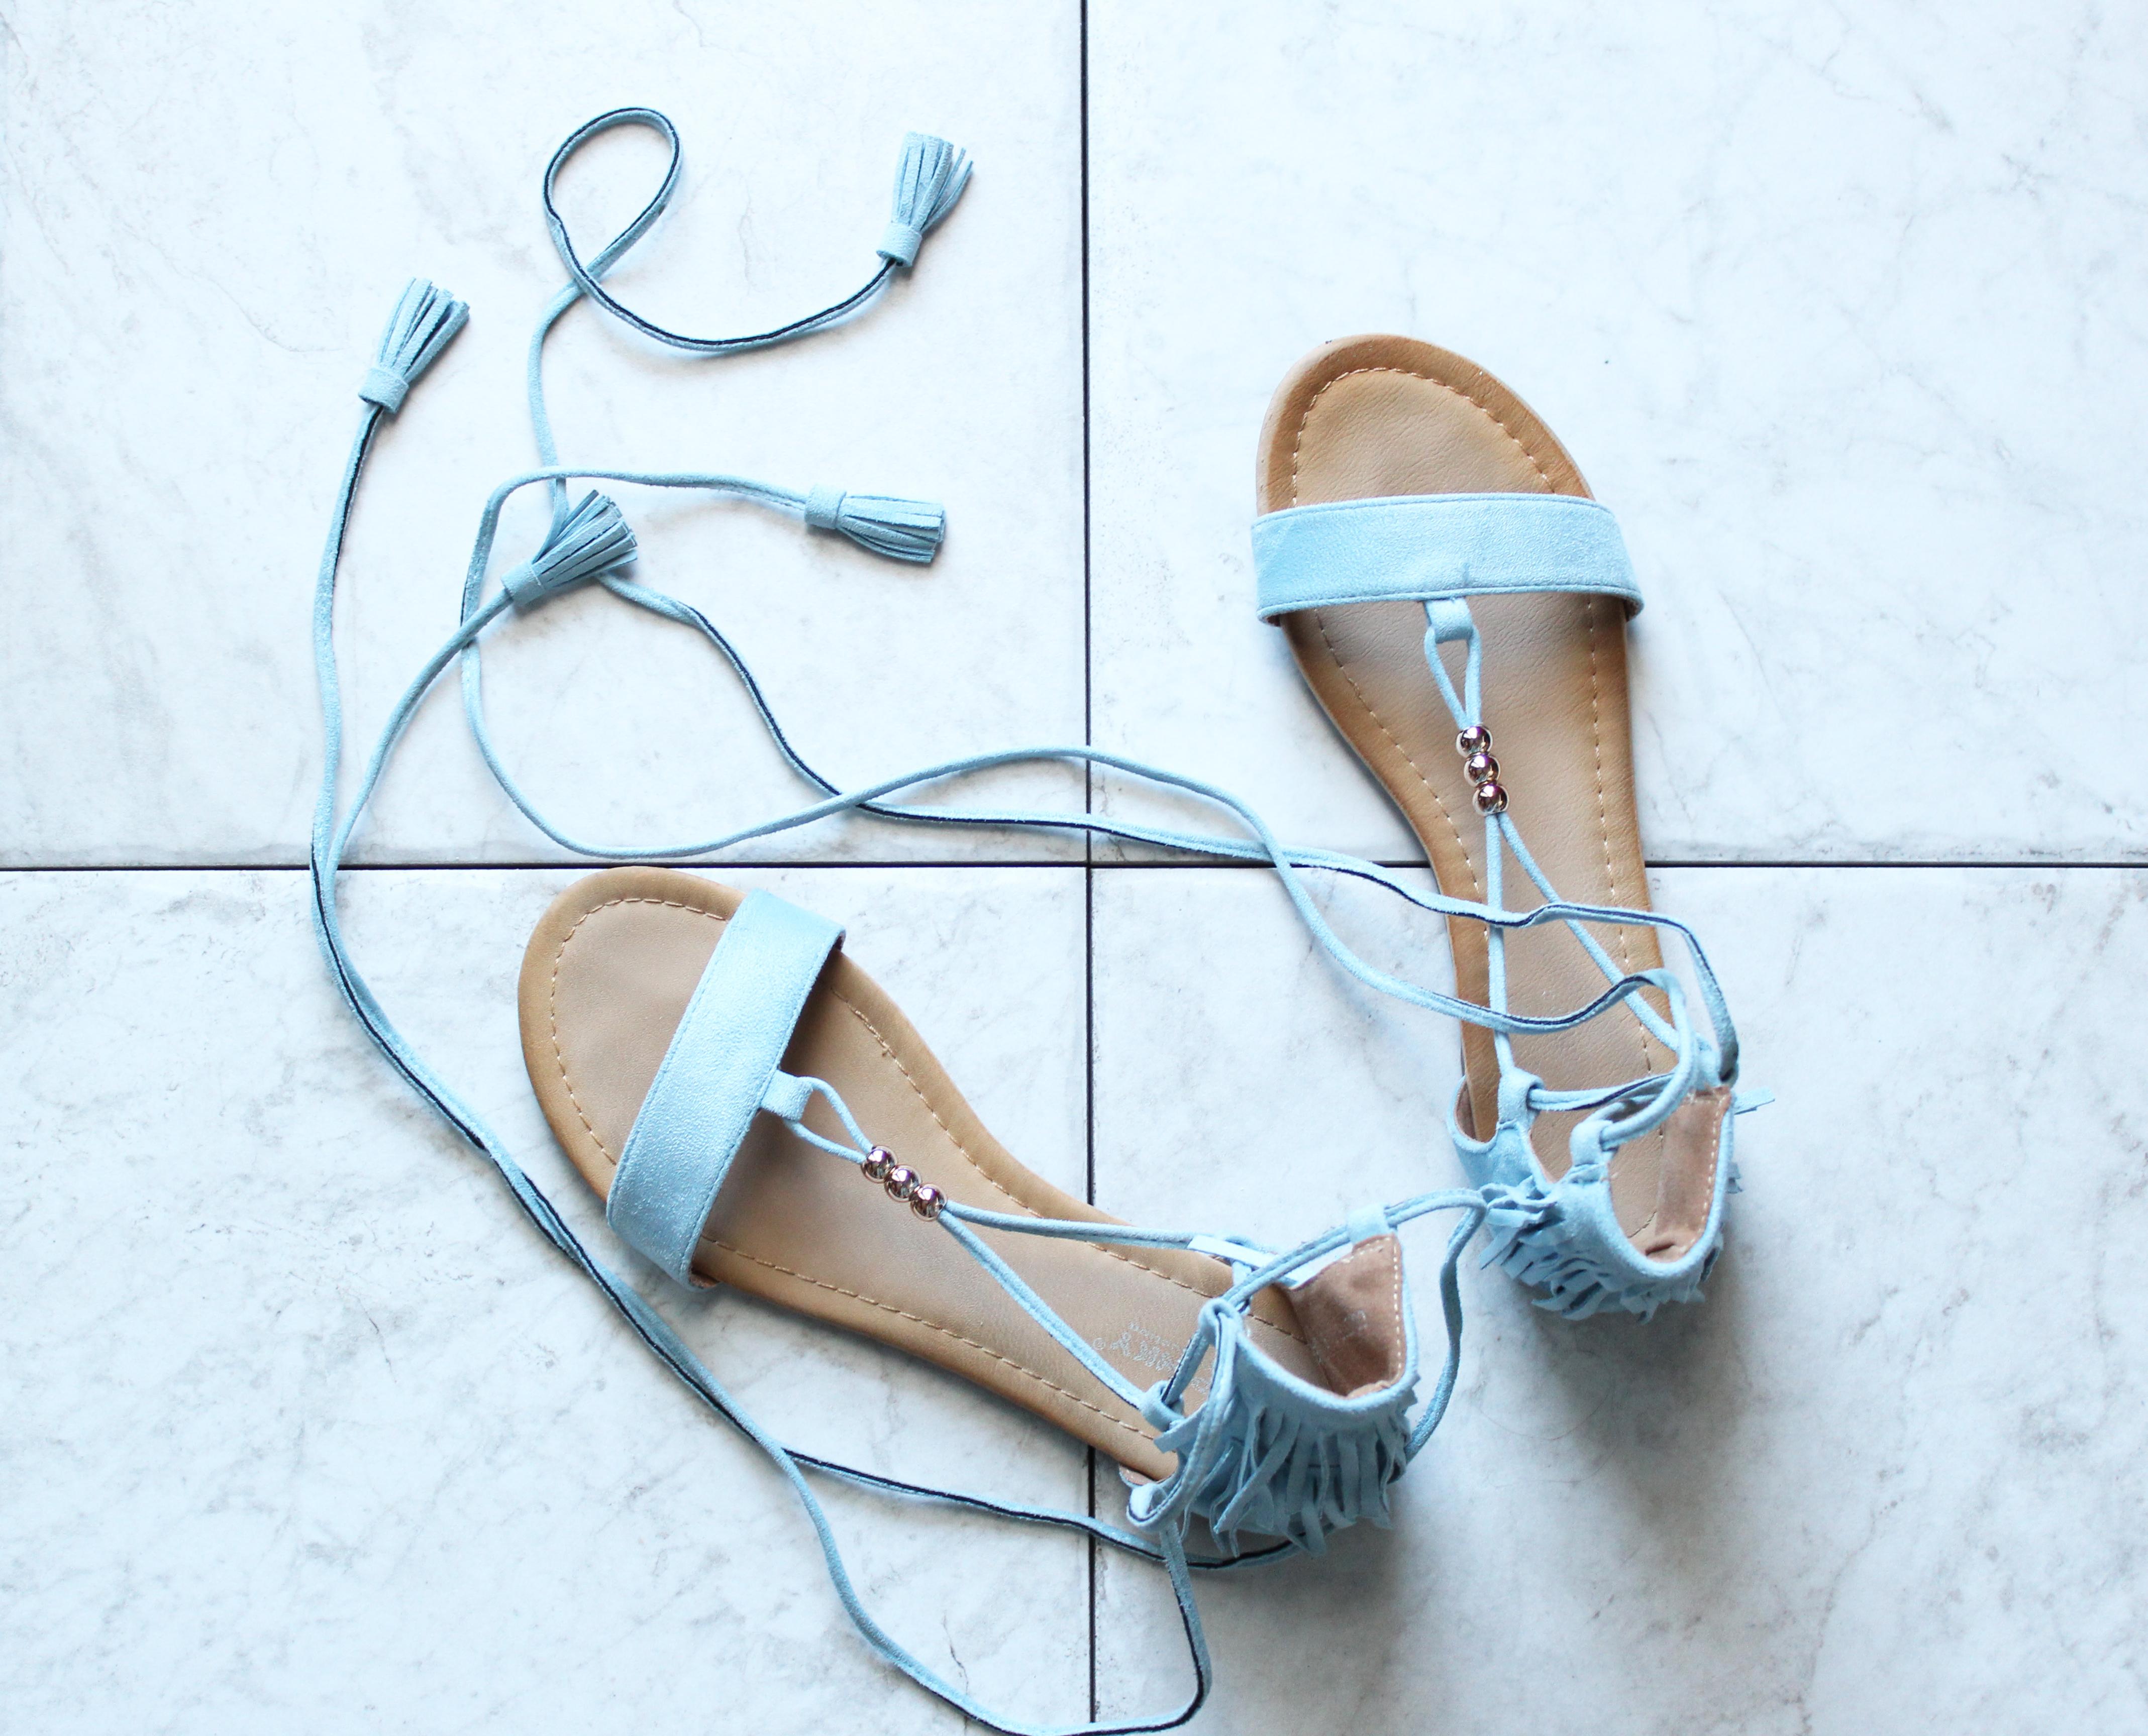 Shuesq Tassel Sandals